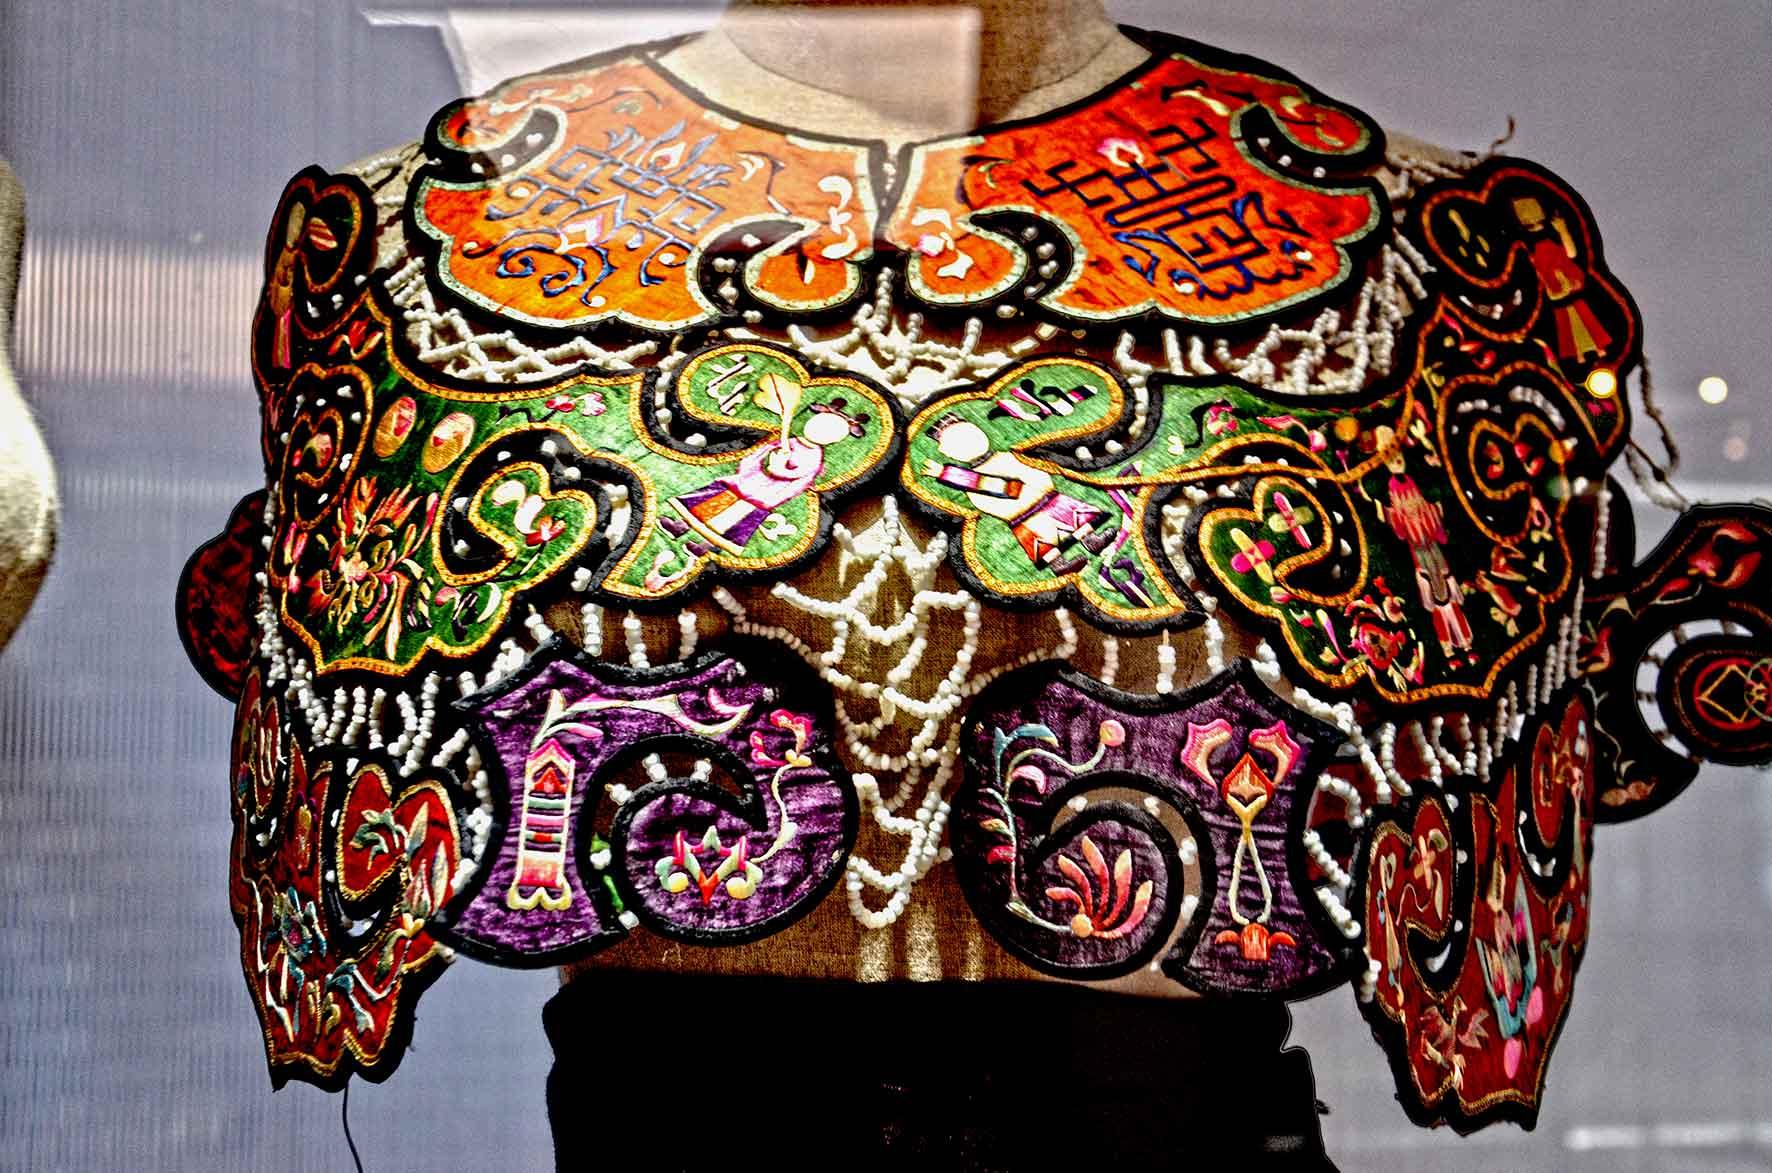 Arte e moda senza frontiere